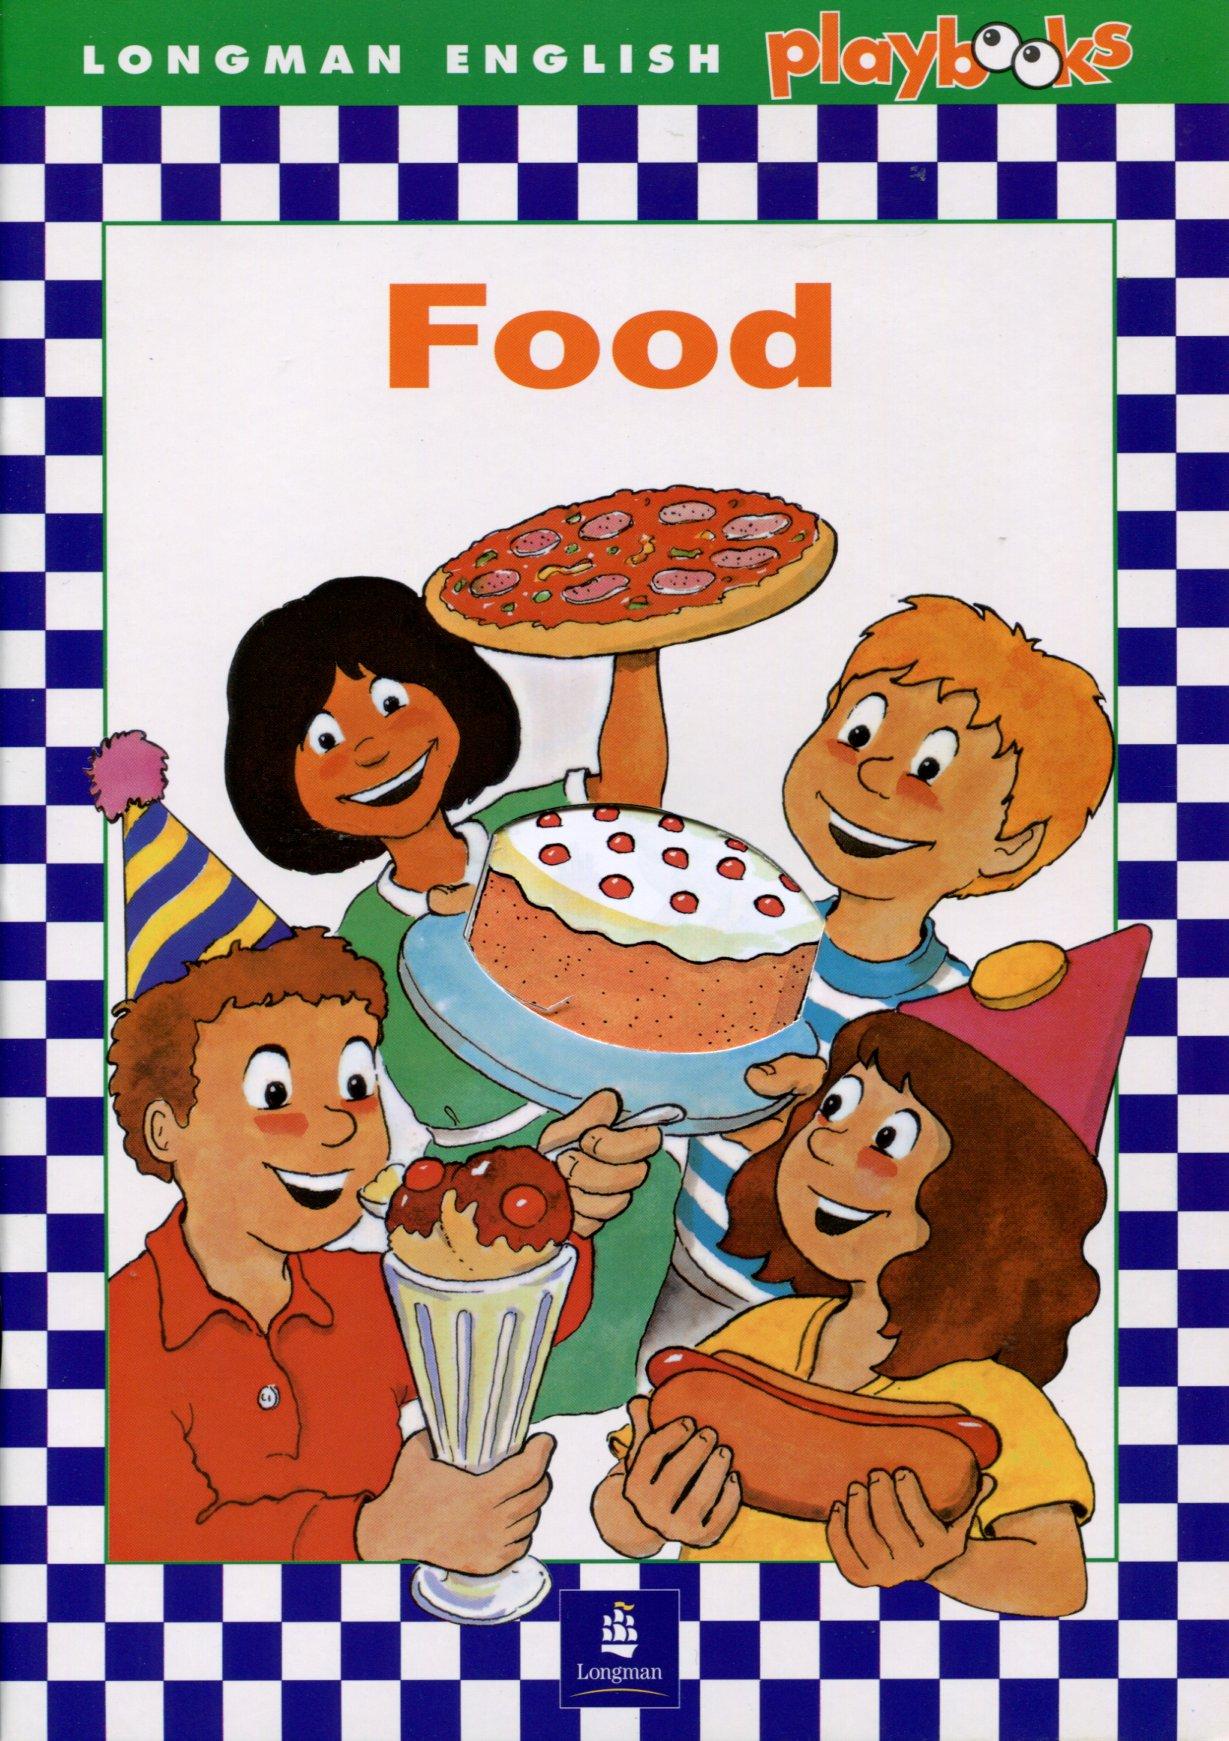 Longman English Playbooks: Food